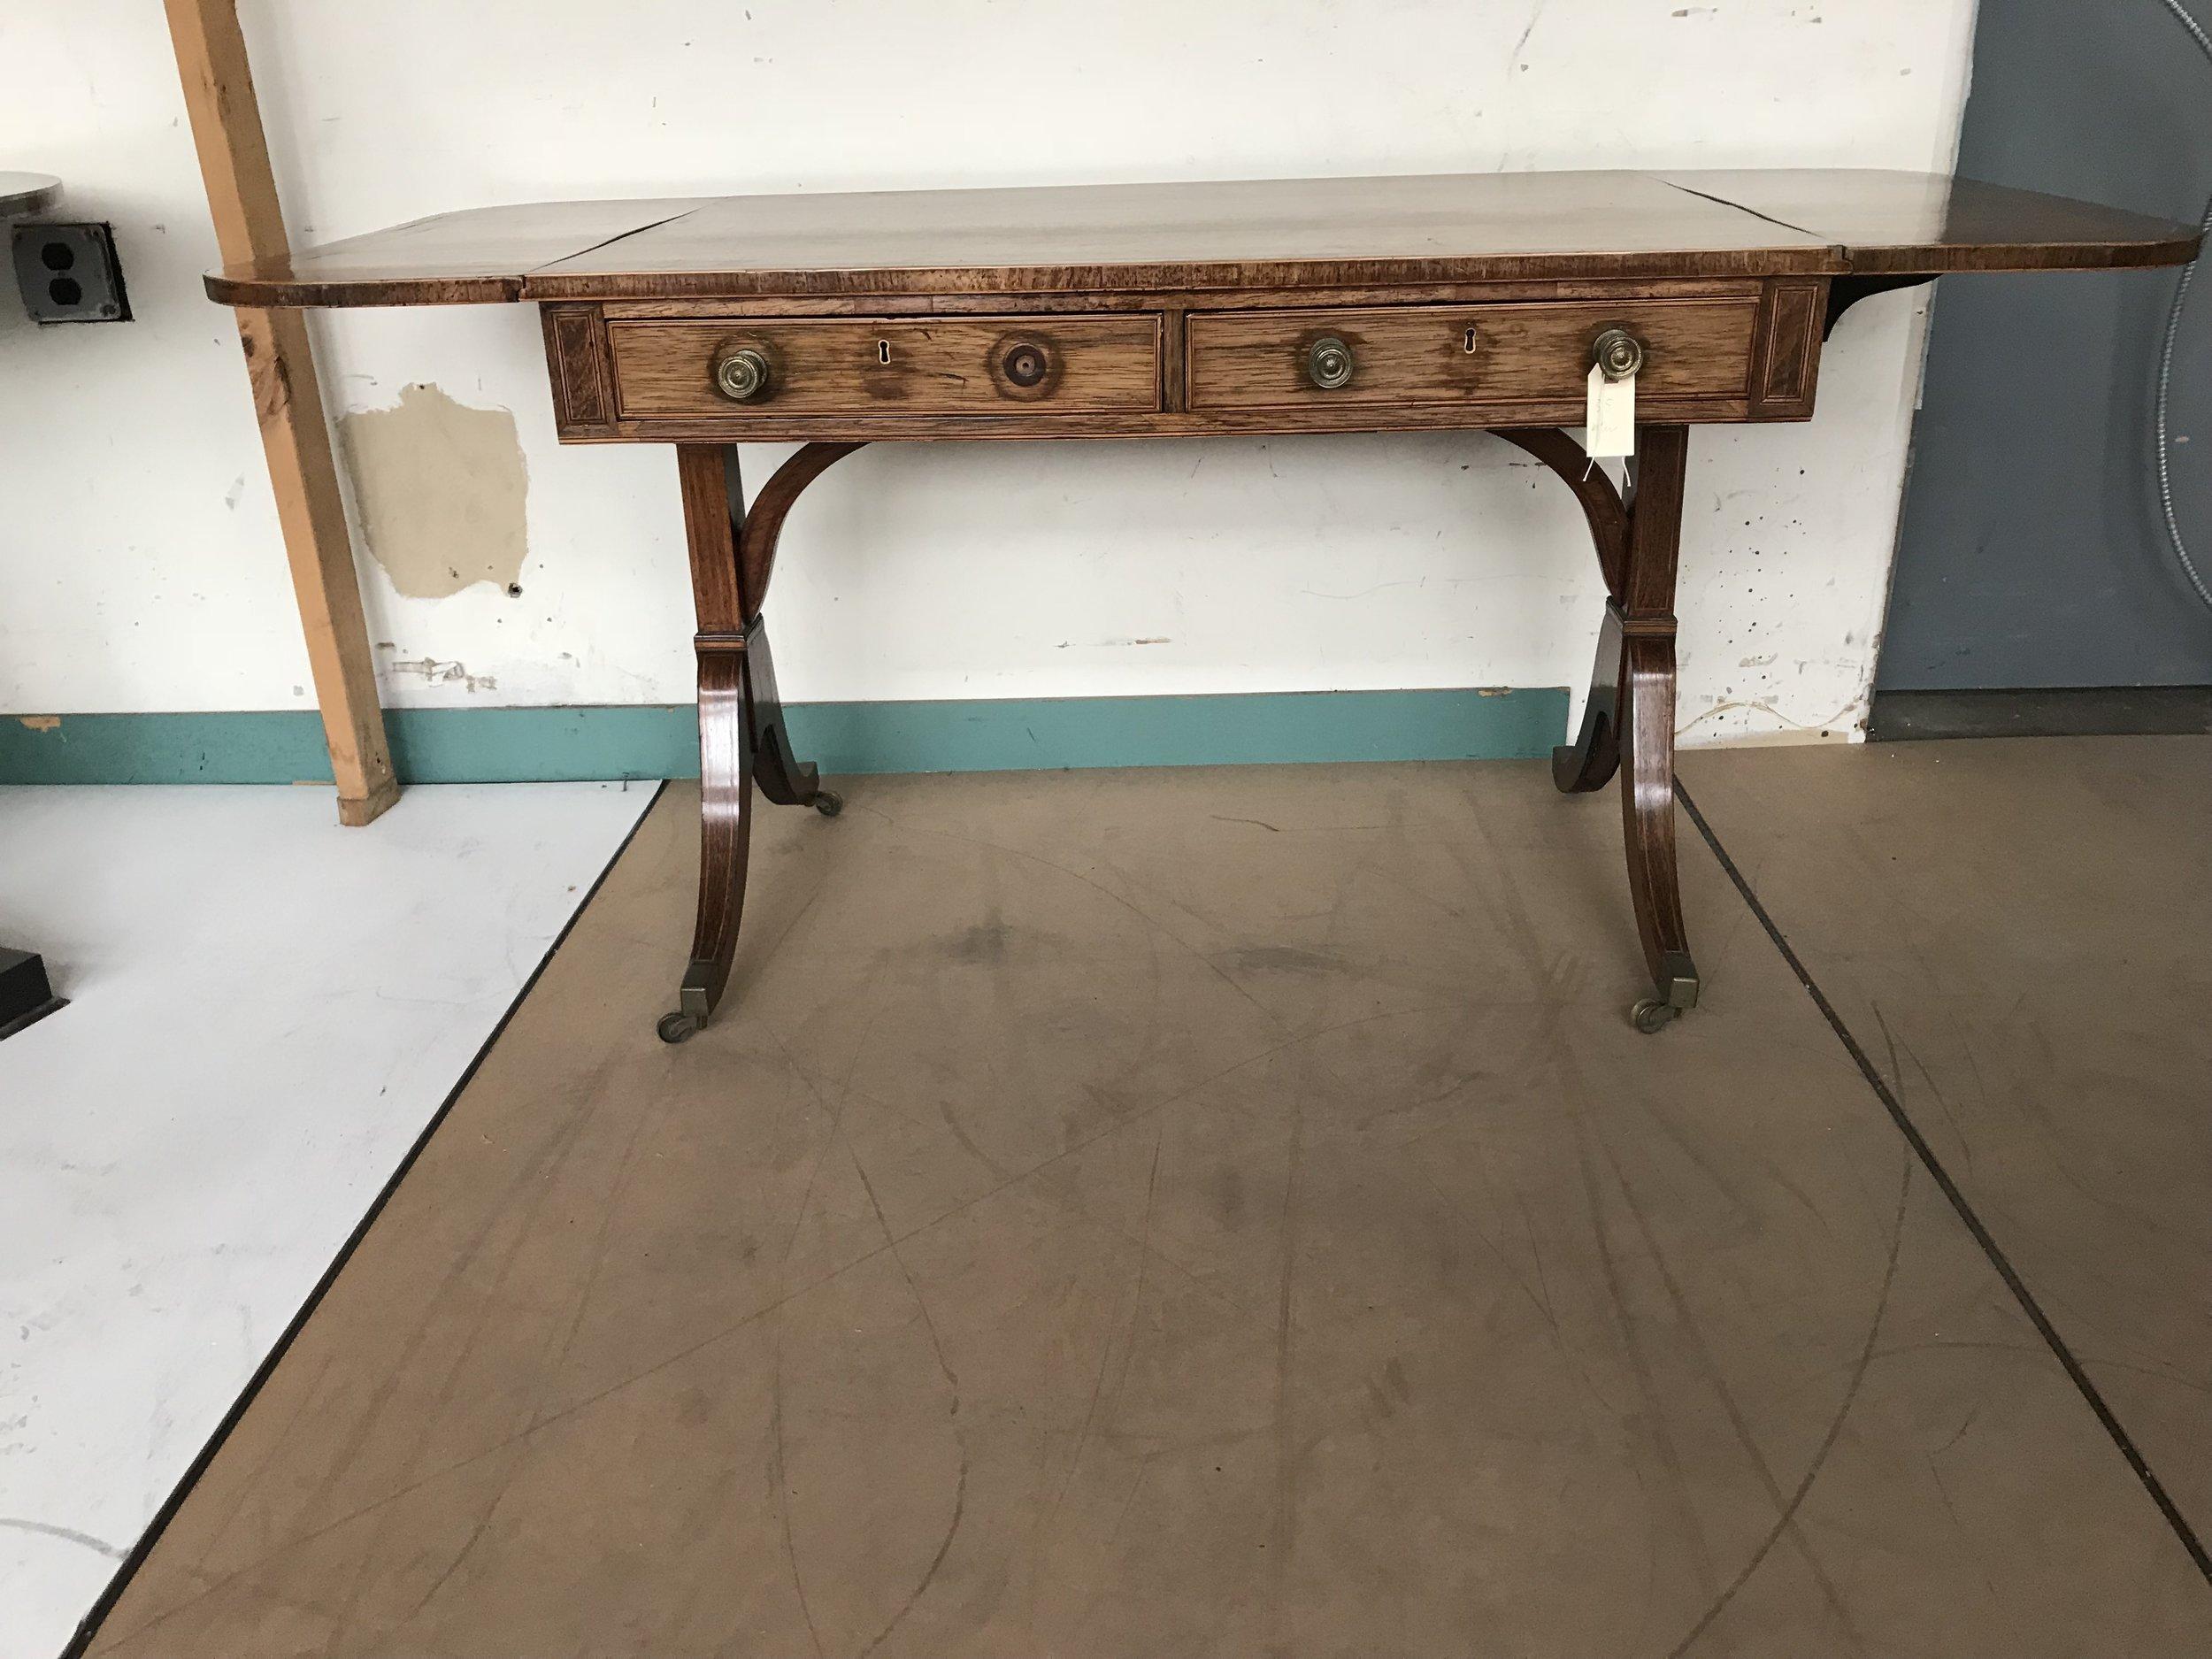 Dropleaf Table1.JPG